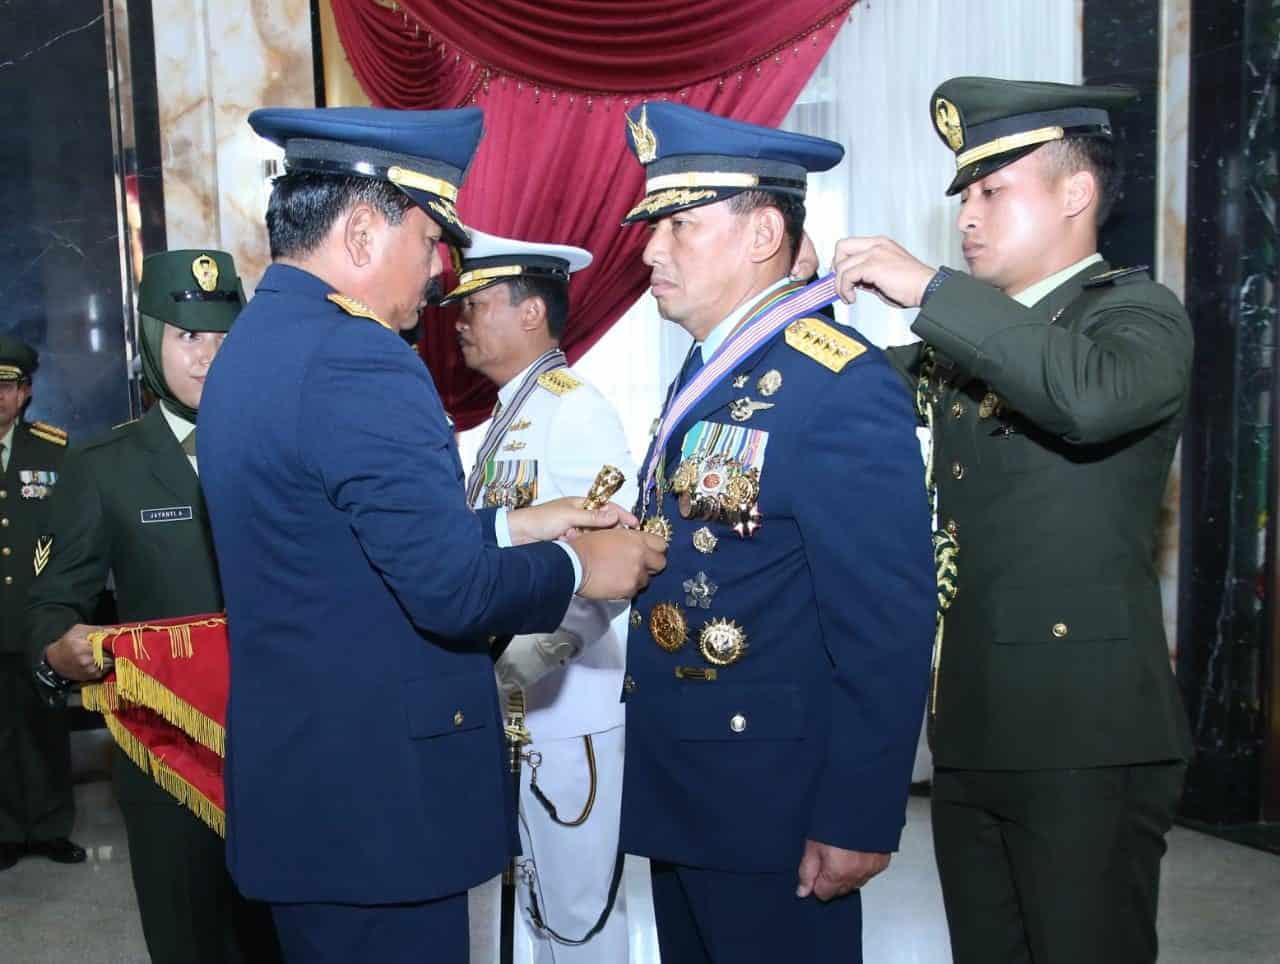 Kasau Terima Tanda Kehormatan Bintang Kartika Eka Paksi Utama dan Bintang Jalasena Utama